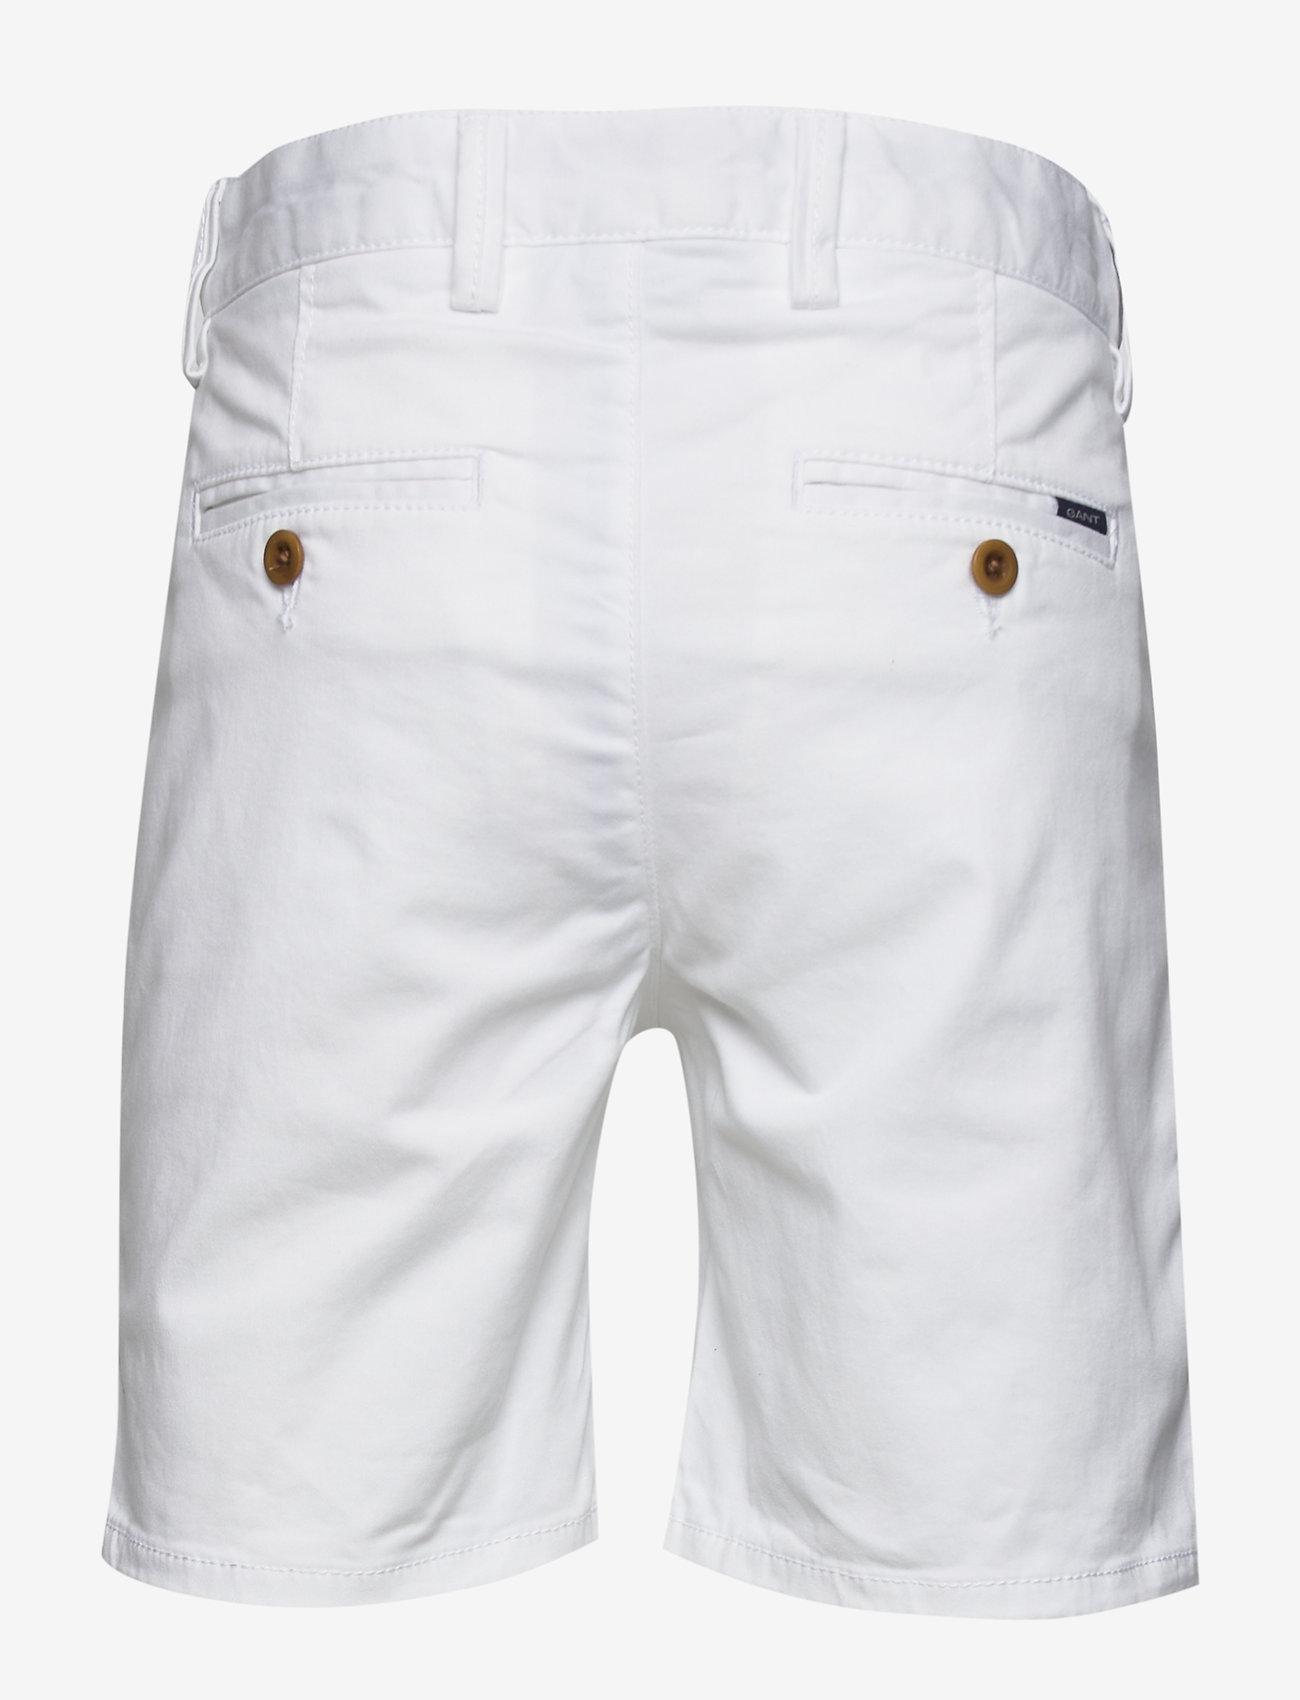 Gant - CHINO SHORTS - shorts - white